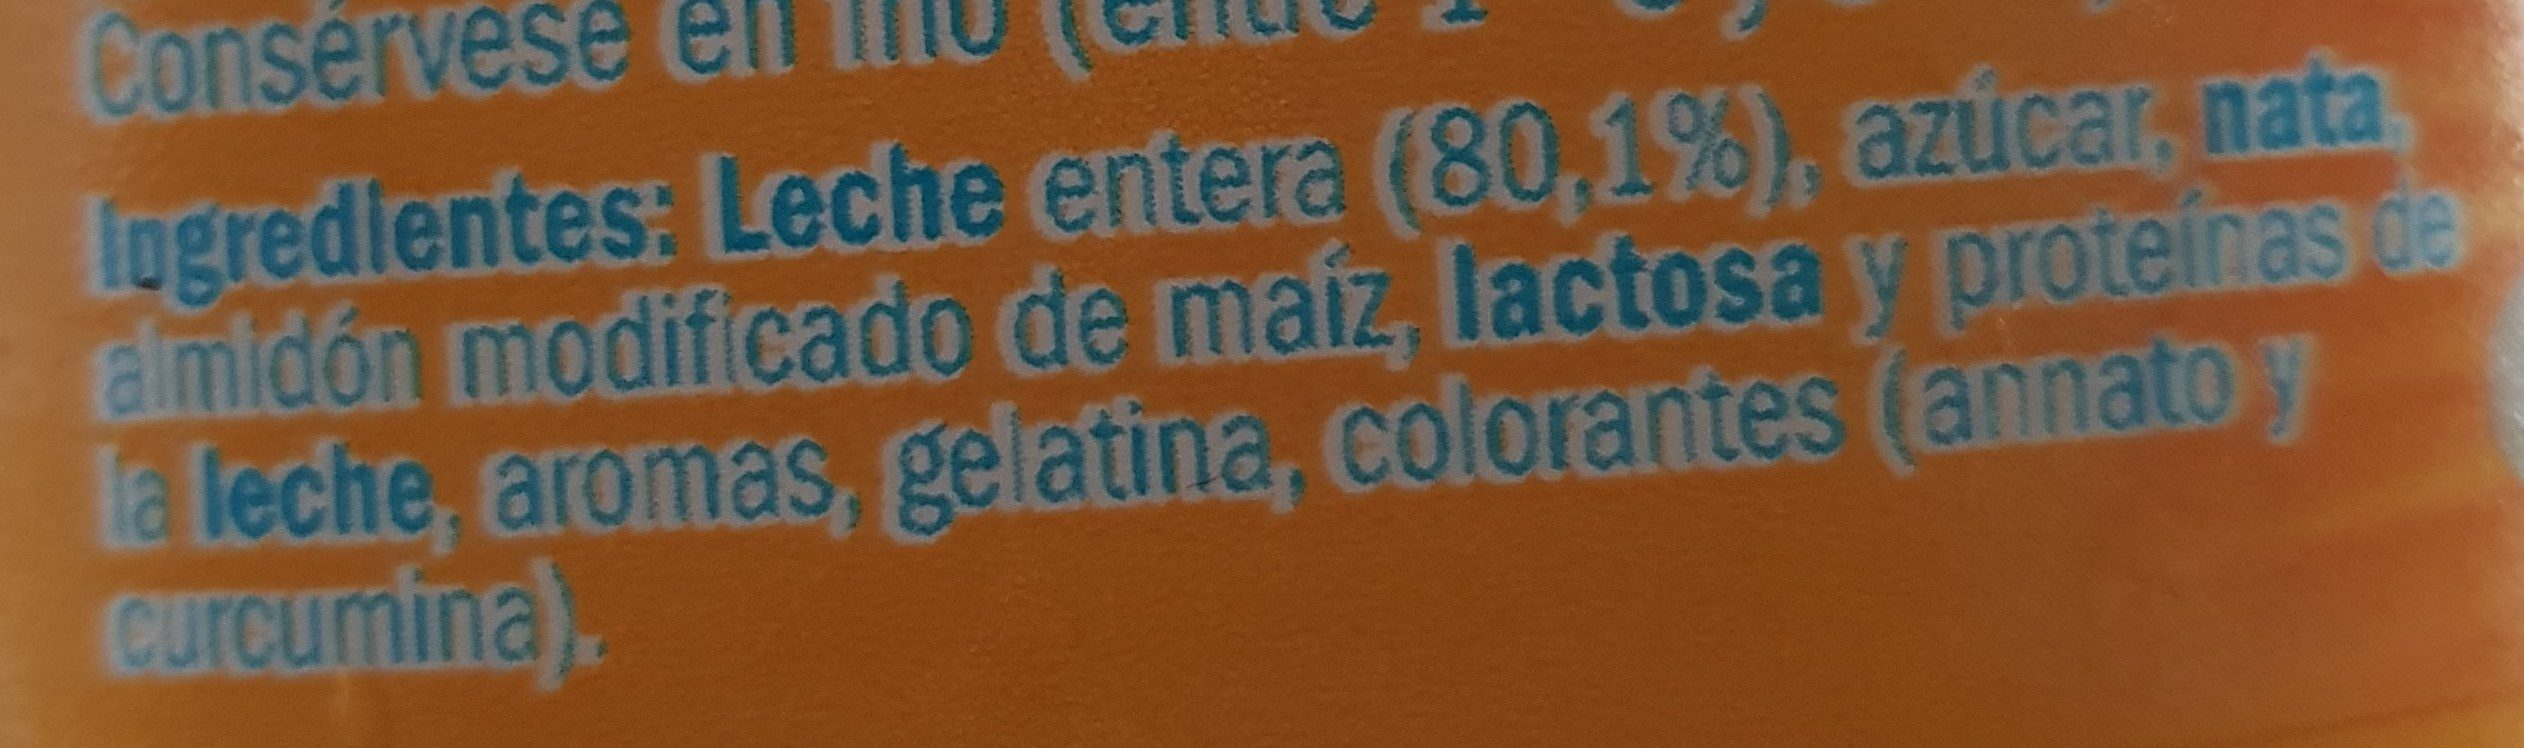 Natillas sabor vainilla - Ingrédients - fr